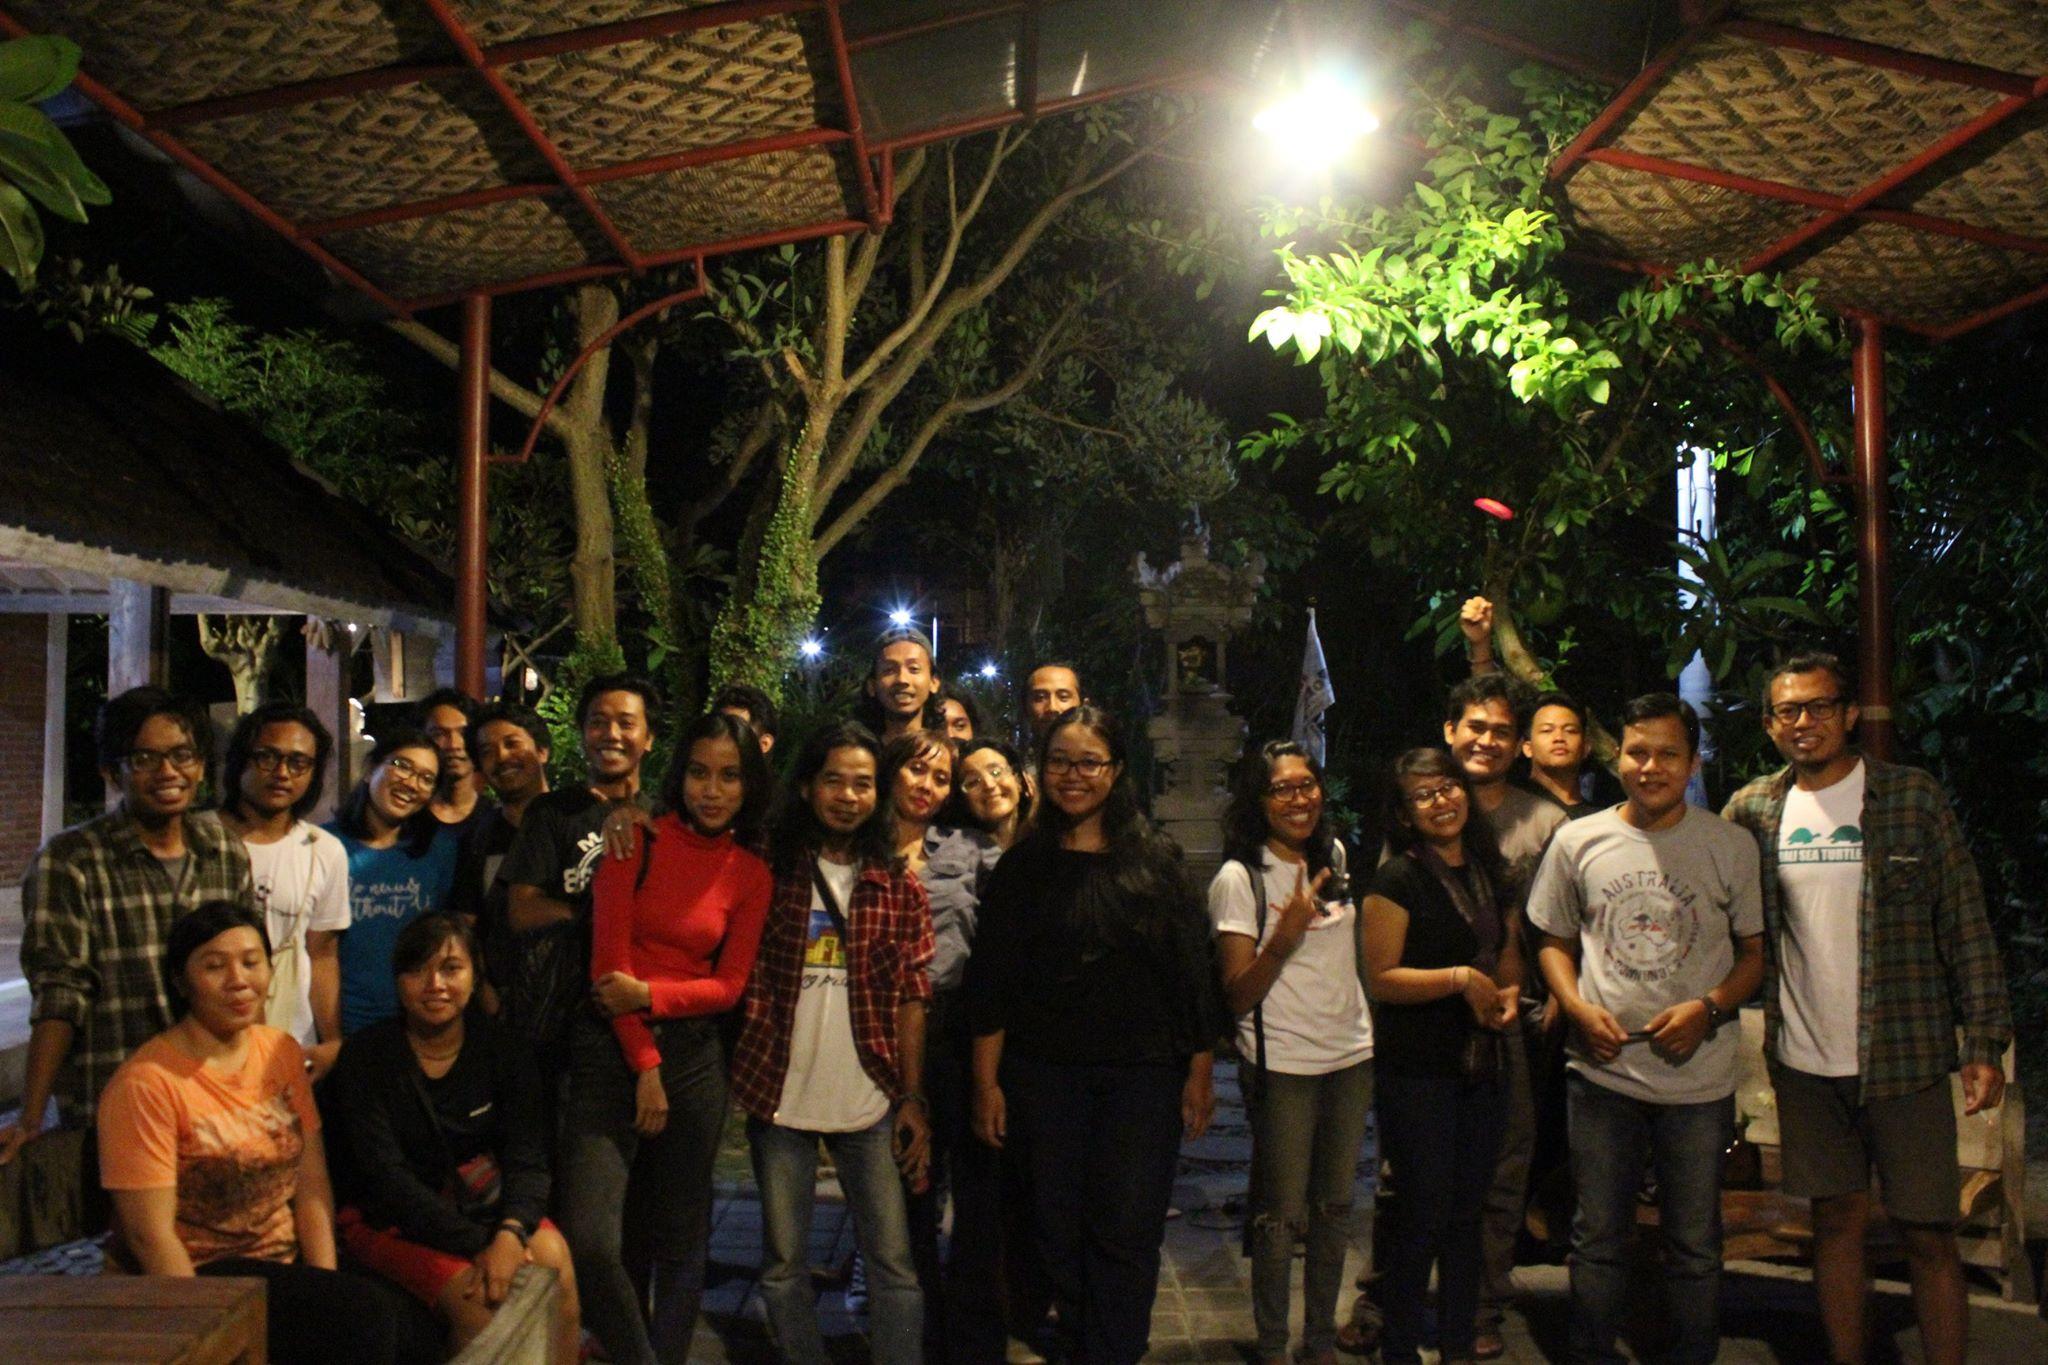 Peluncuran dan Diskusi Kumpulan Cerpen Khotbah karya Dwi S. Wibowo